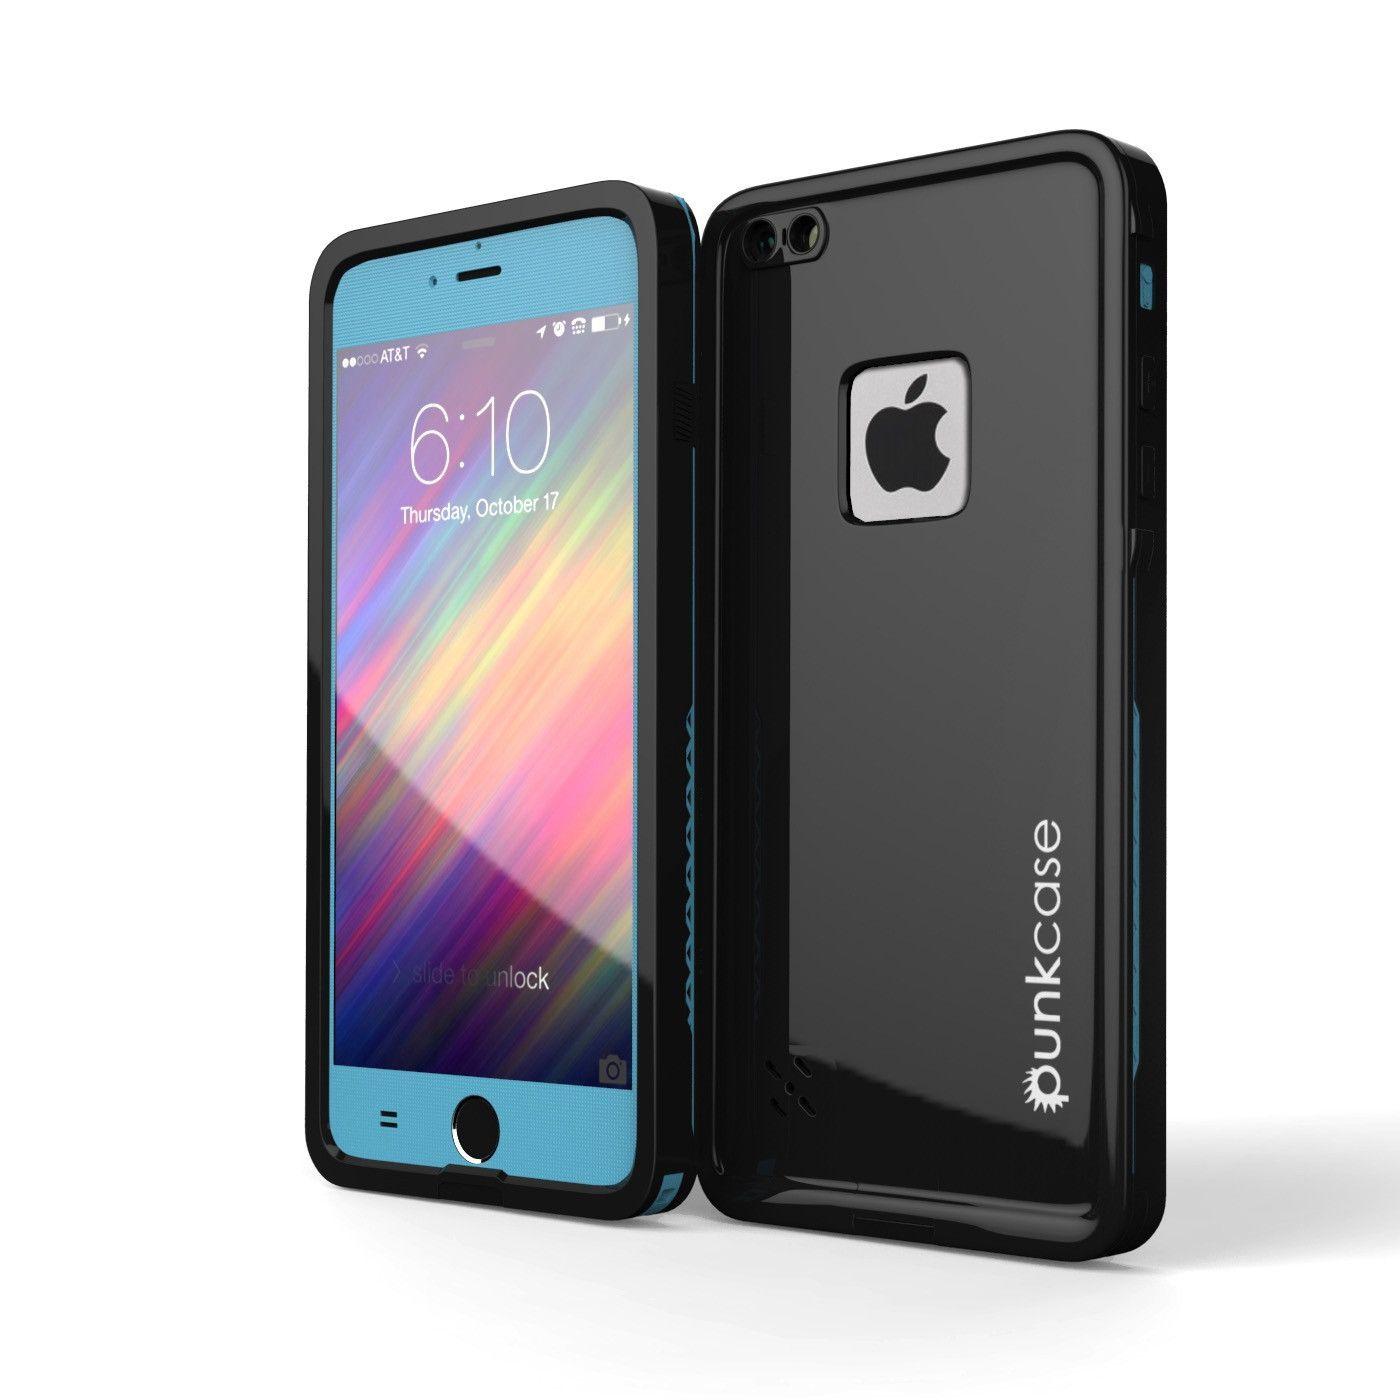 "iPhone 6 Waterproof Case, Punkcase SpikeStar Light Blue Apple iPhone 6 Thin Fit 6.6ft Underwater IP68 Waterproof Case - for iPhone 6 4.7"""" PUNKIP6R003"